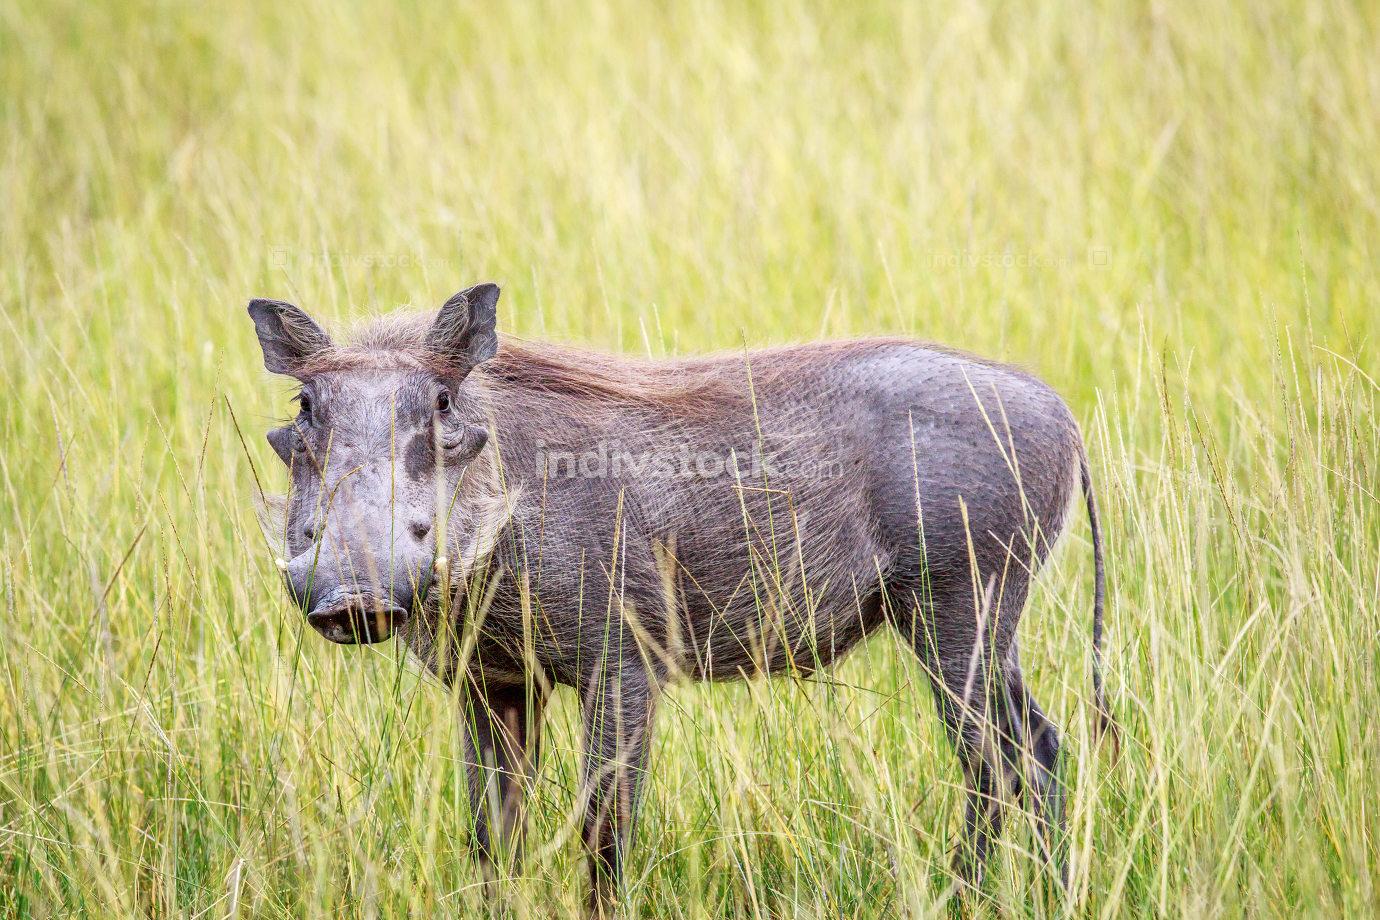 Warthog standing in long grass.